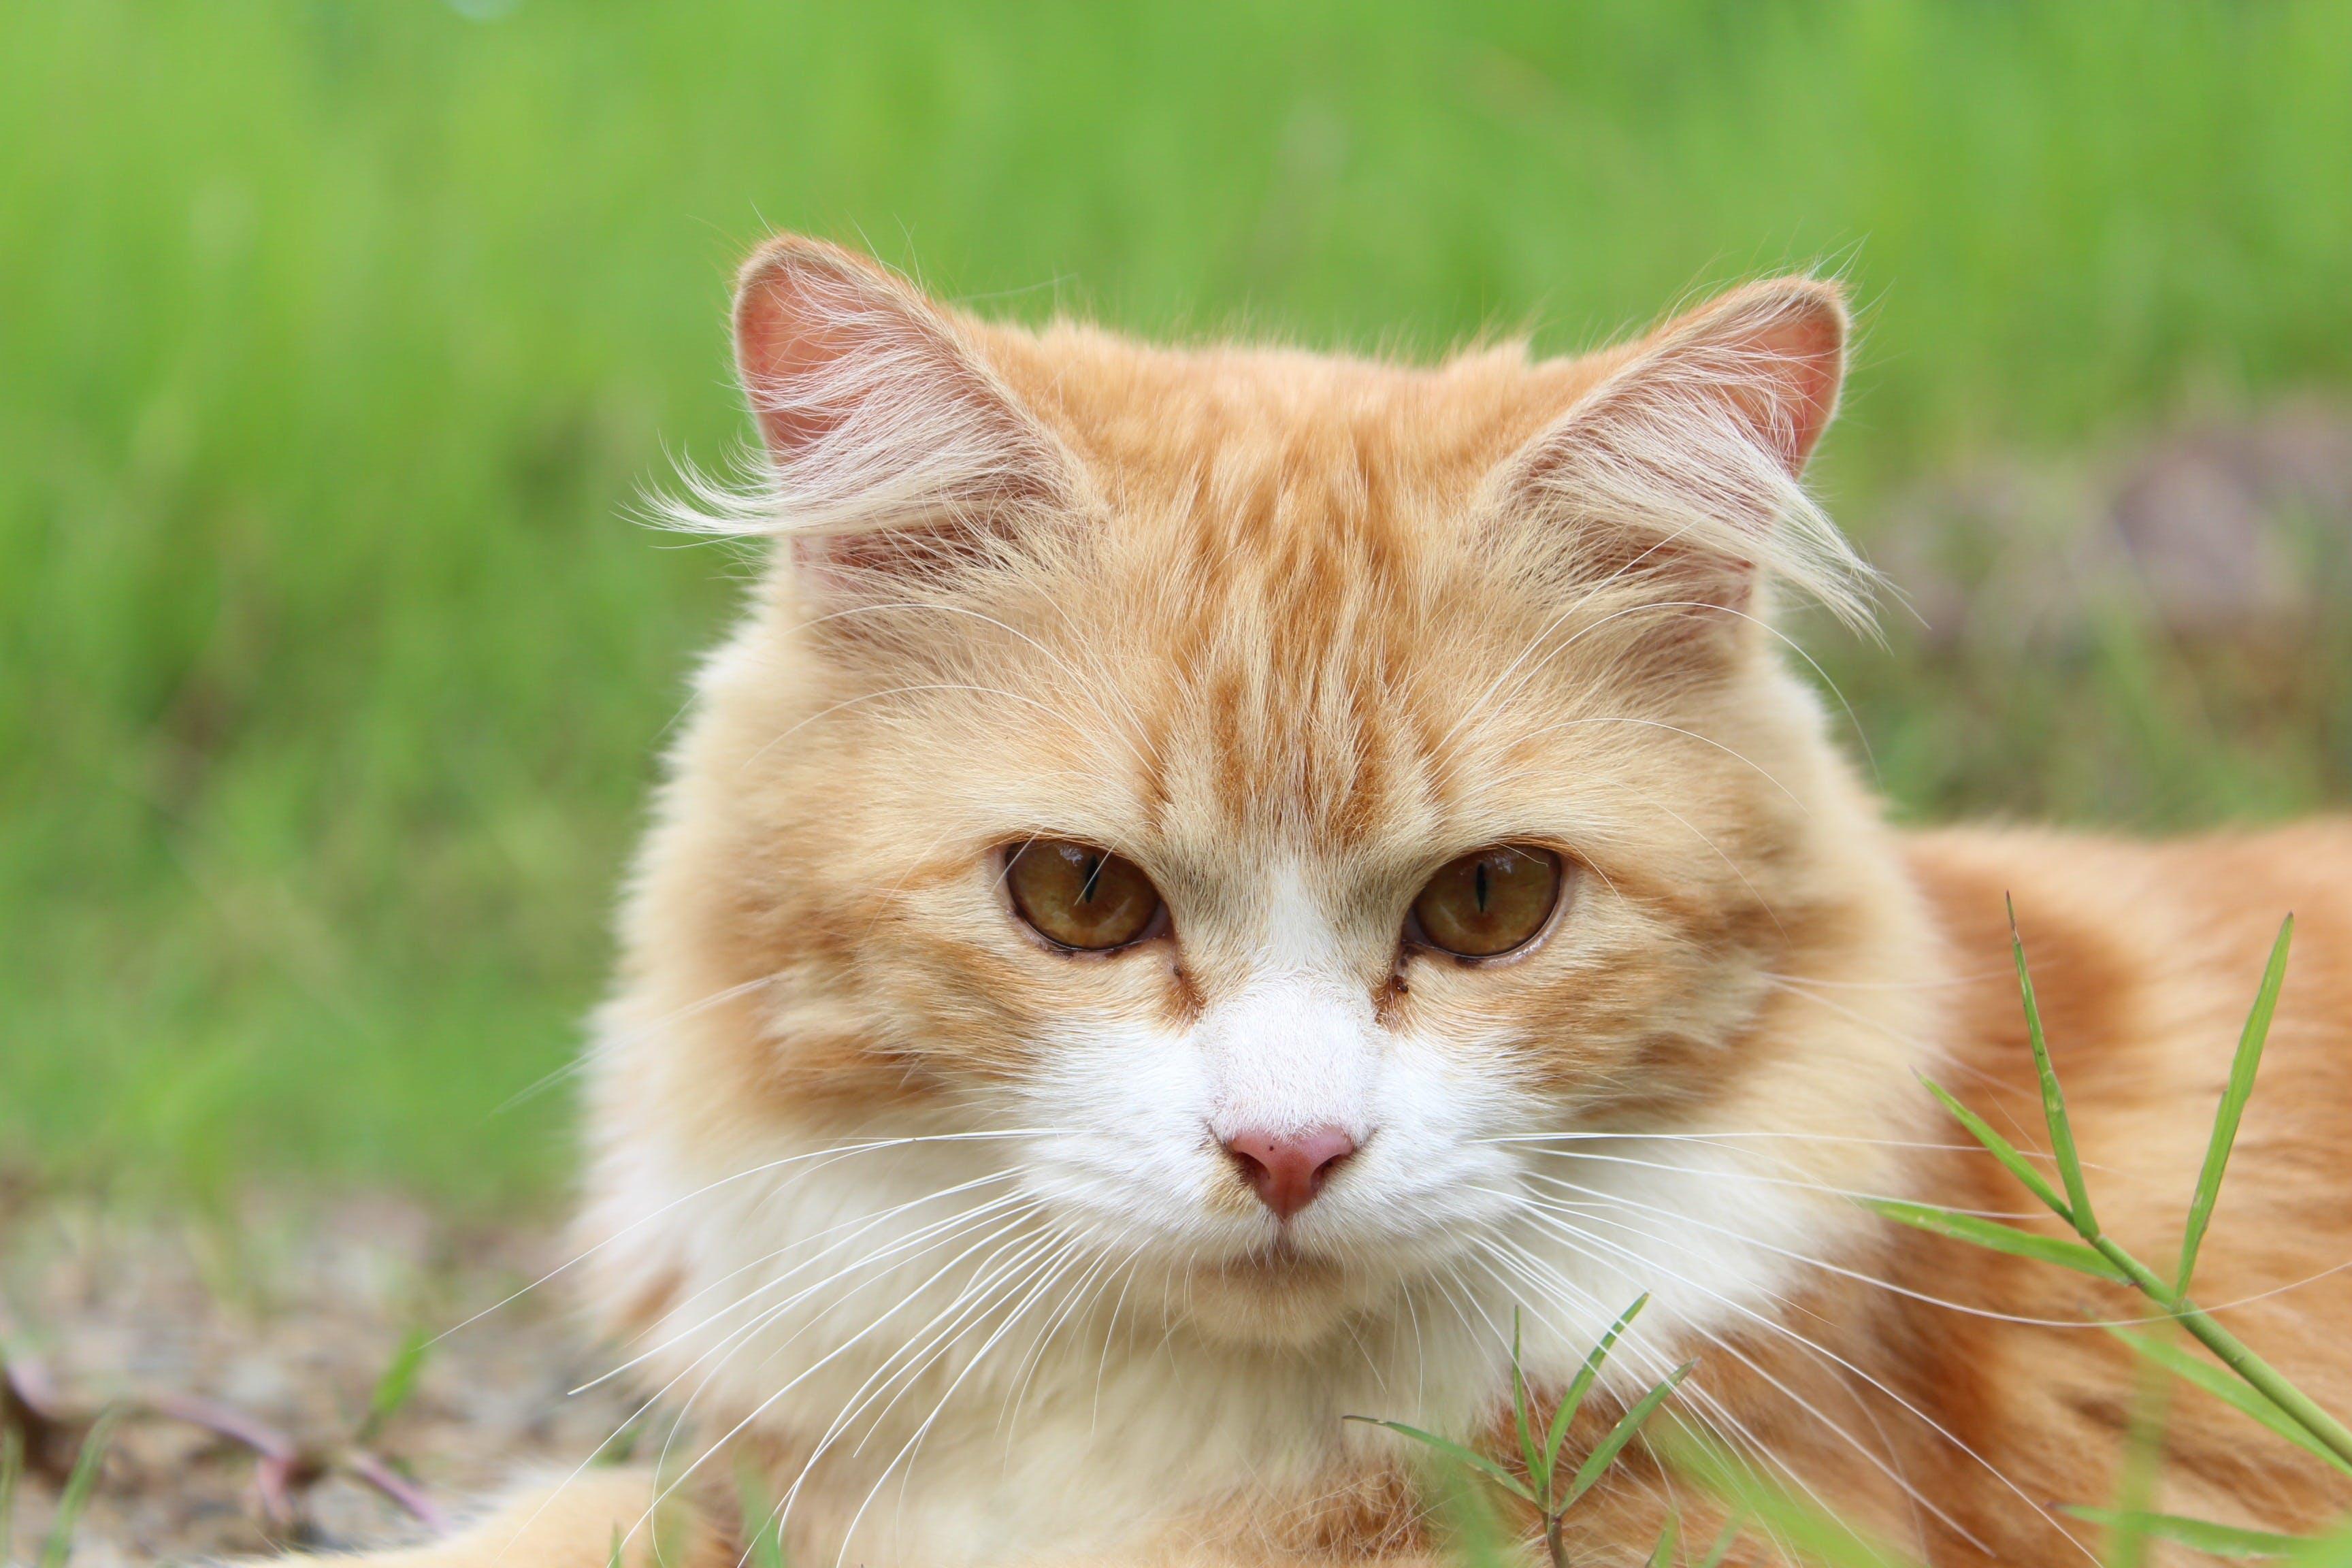 Orange Tabby Cat in Macro Lens